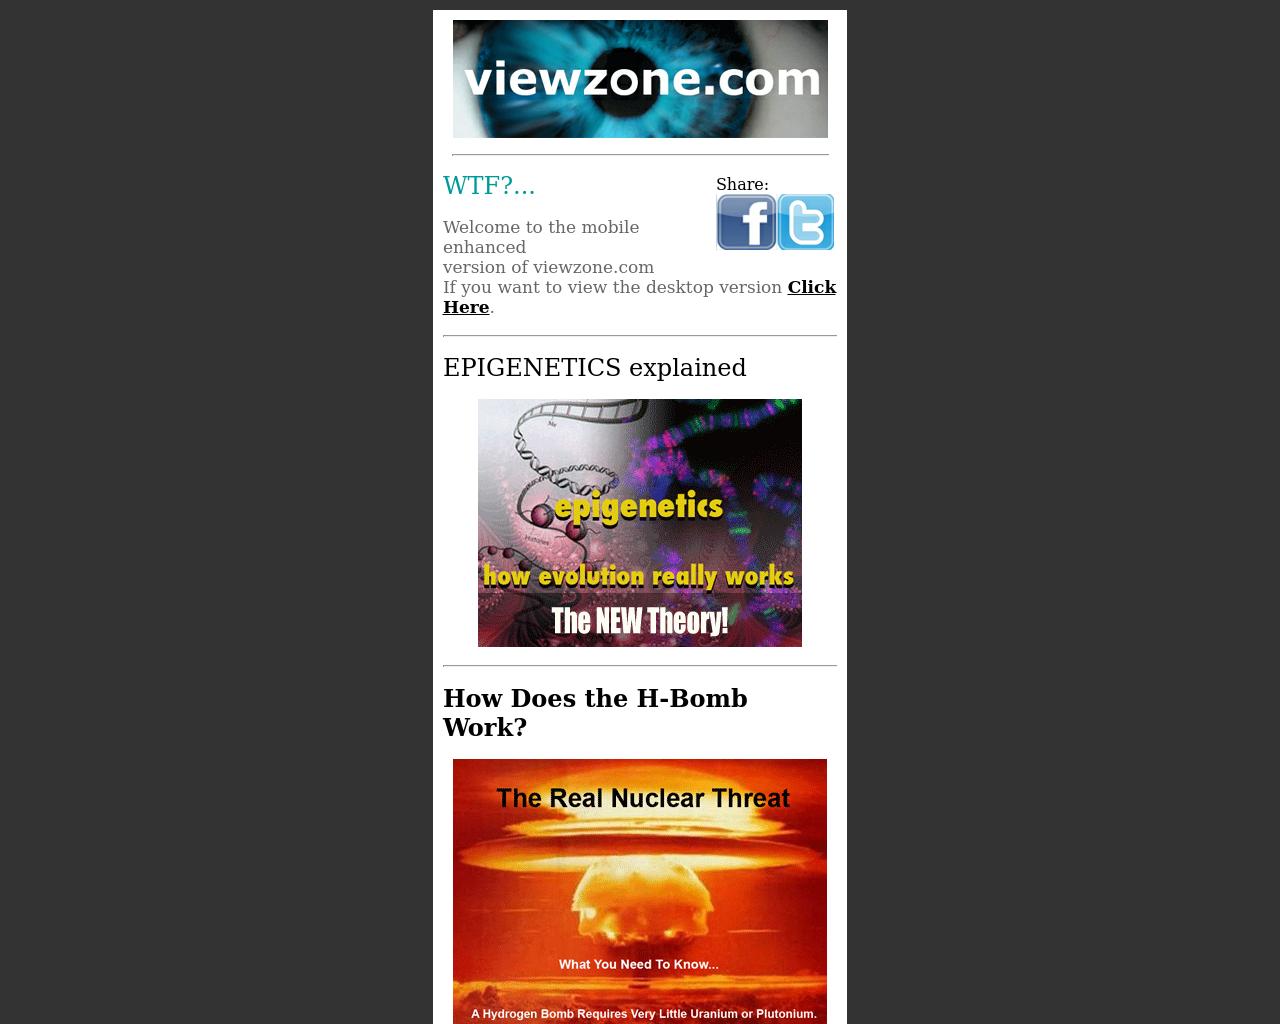 ViewZone.com-Advertising-Reviews-Pricing